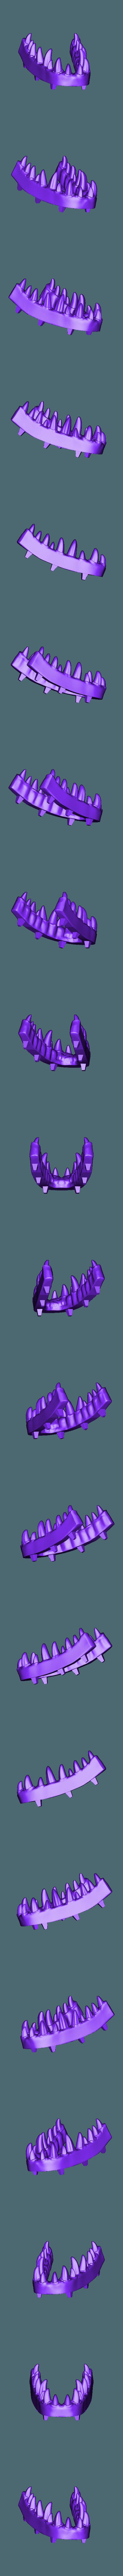 T-rex_Lowpolygon_3.stl Download OBJ file T-rex Tyrannosaurus • 3D printable object, Dynastinae